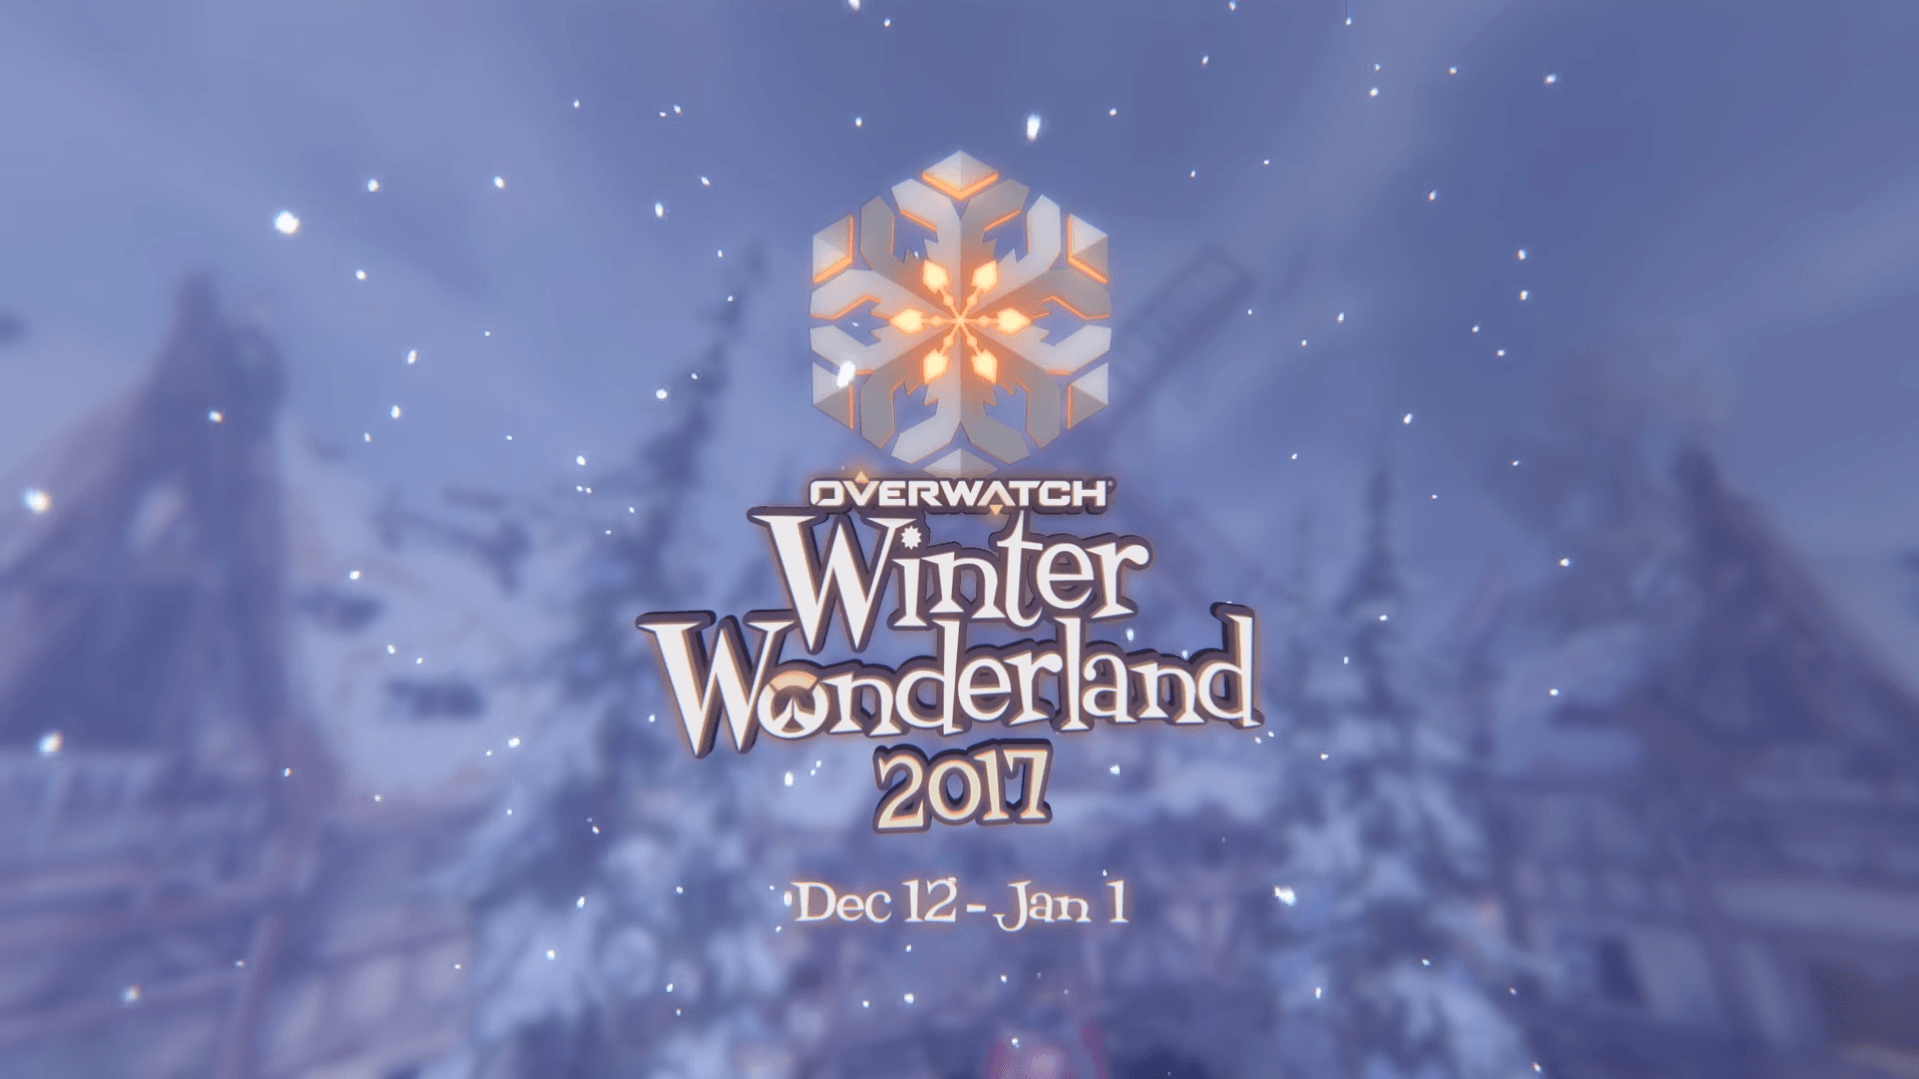 record: הWinter Wonderland חוזר לסבב שני! cover image